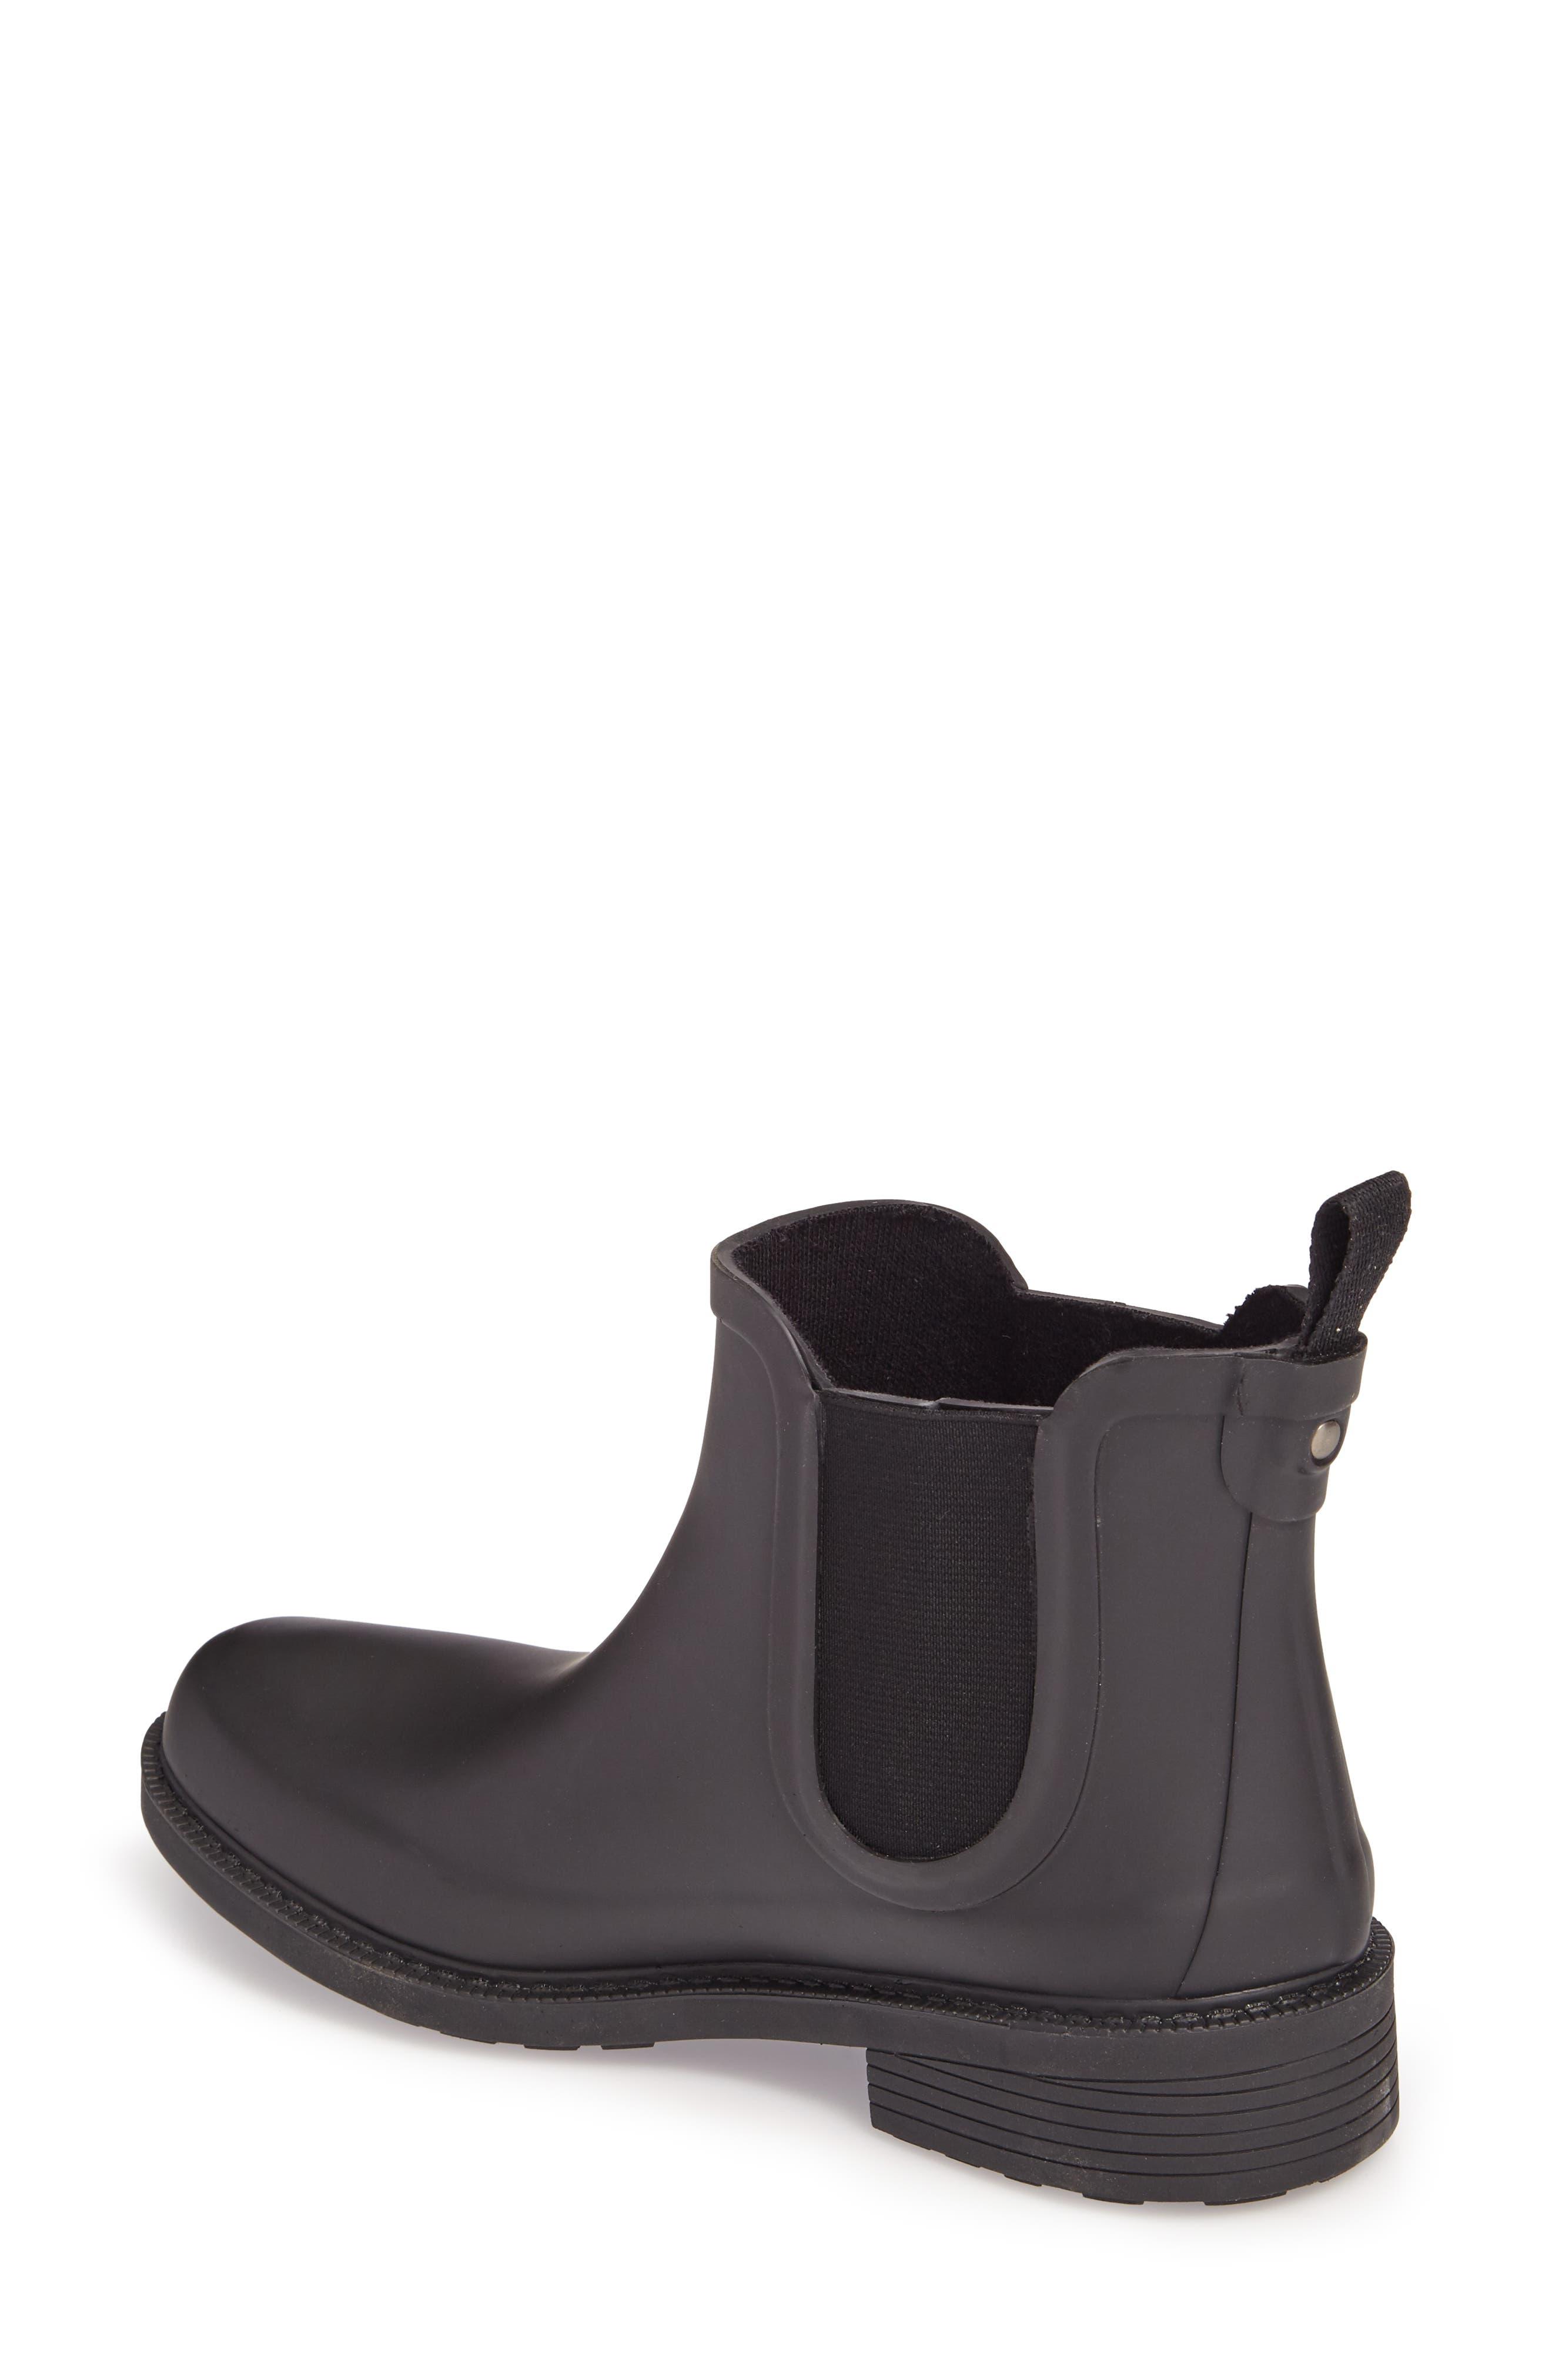 MADEWELL, The Chelsea Rain Boot, Alternate thumbnail 2, color, TRUE BLACK RUBBER